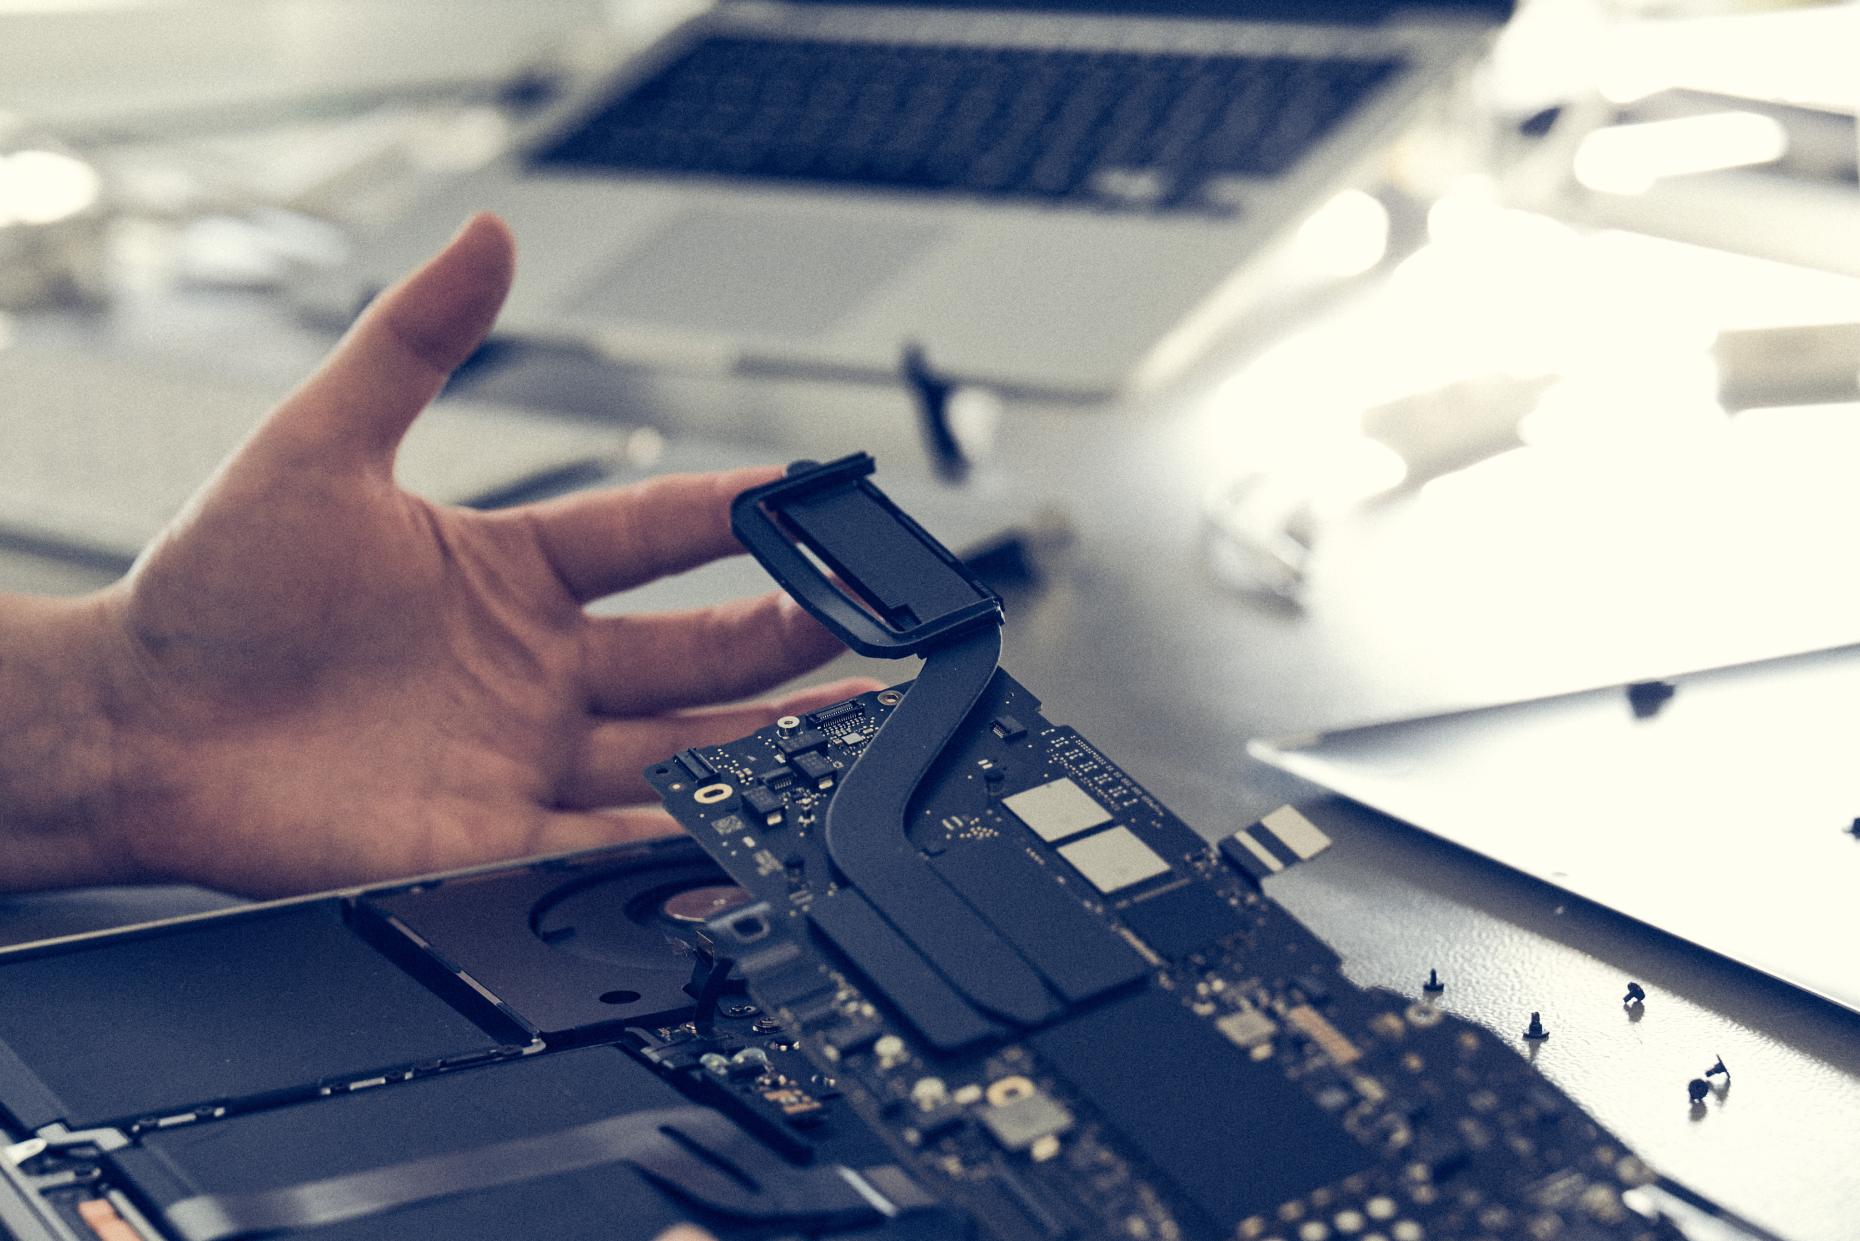 A repair technician works on an Apple MacBook.